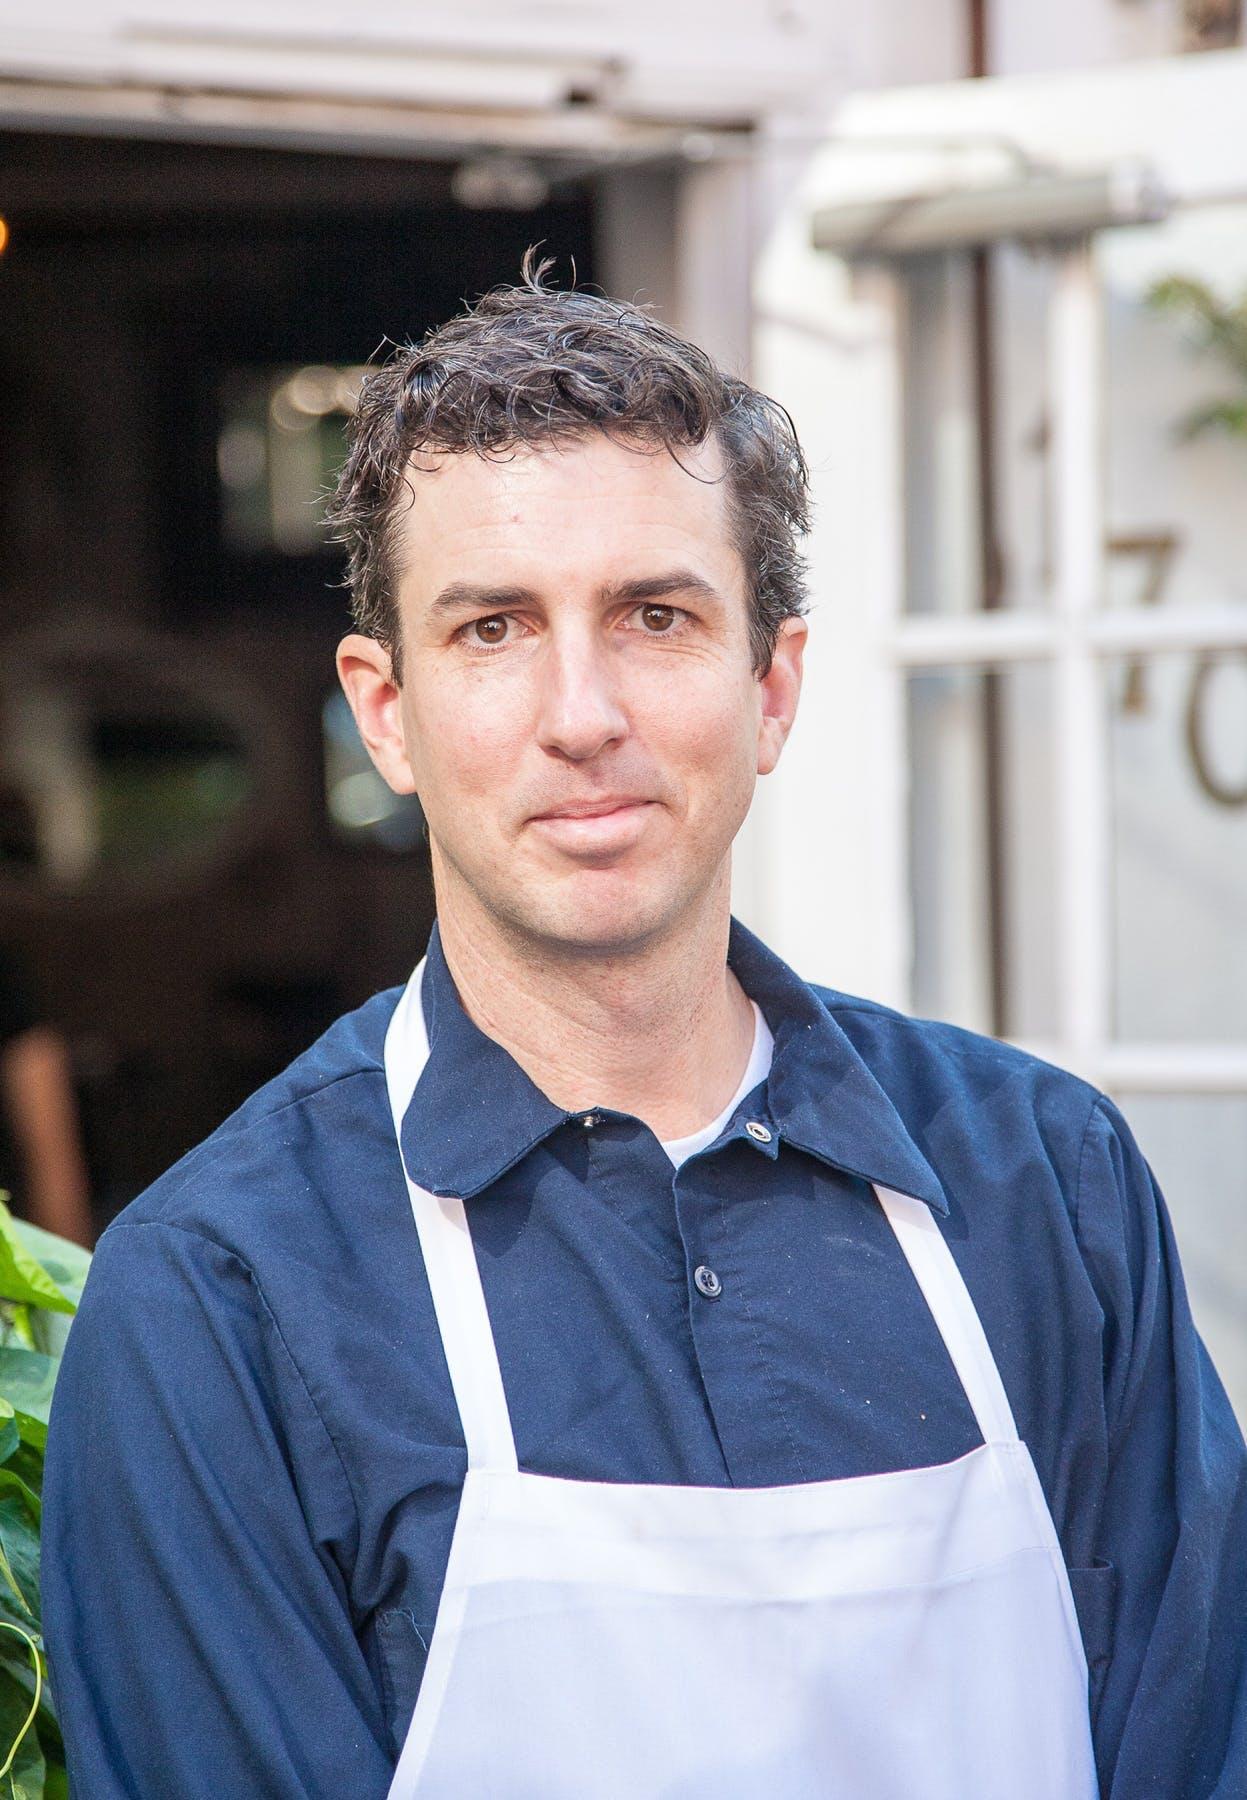 patrick mcgrath executive chef